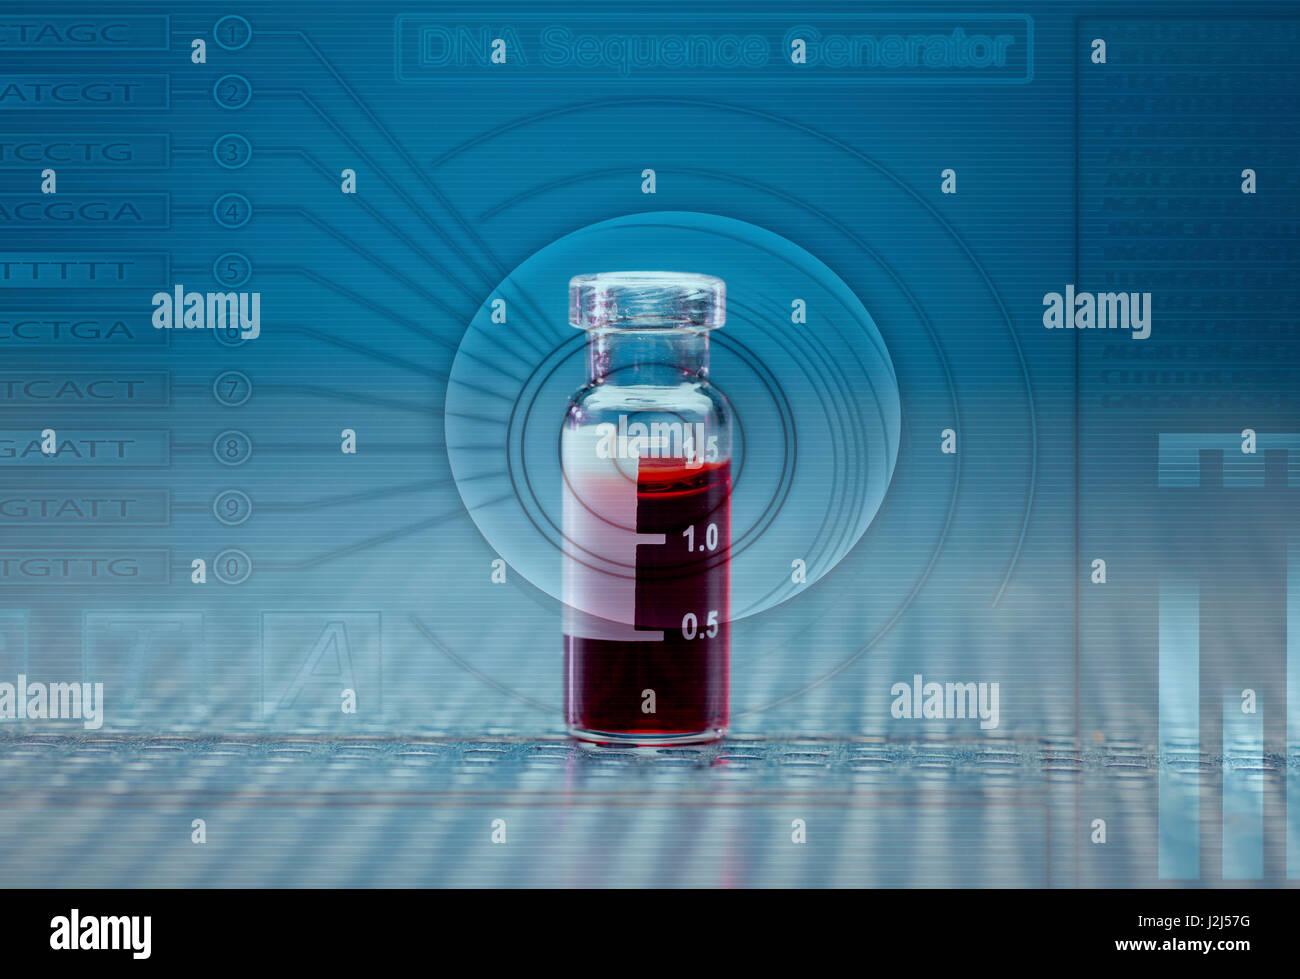 Virology tube with sample. - Stock Image